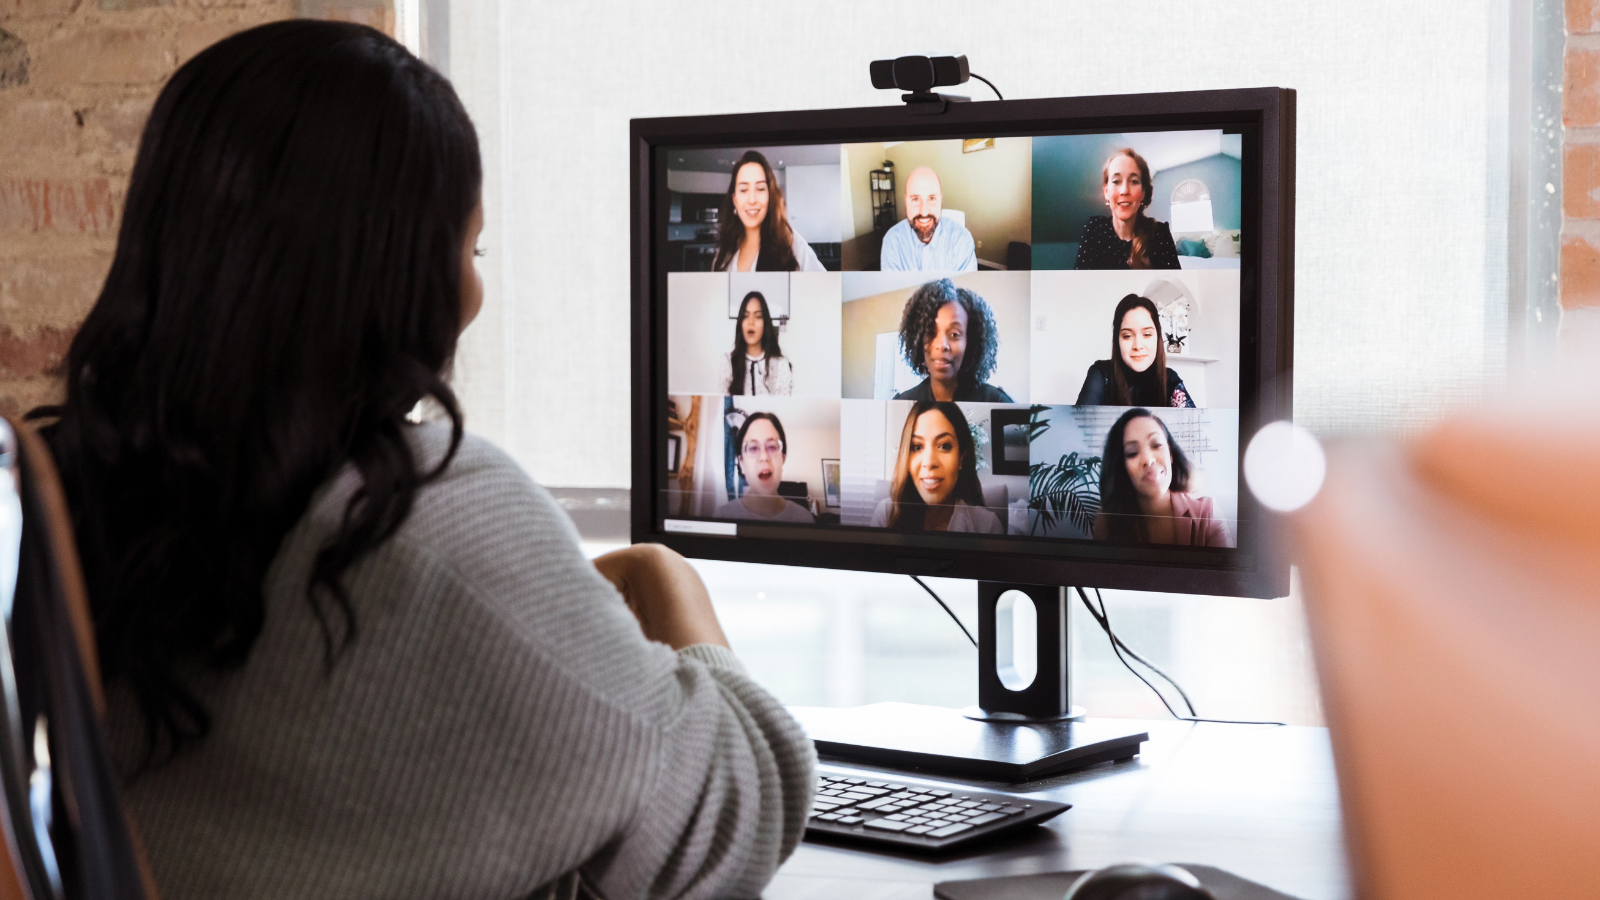 Virtual Meeting Mistakes